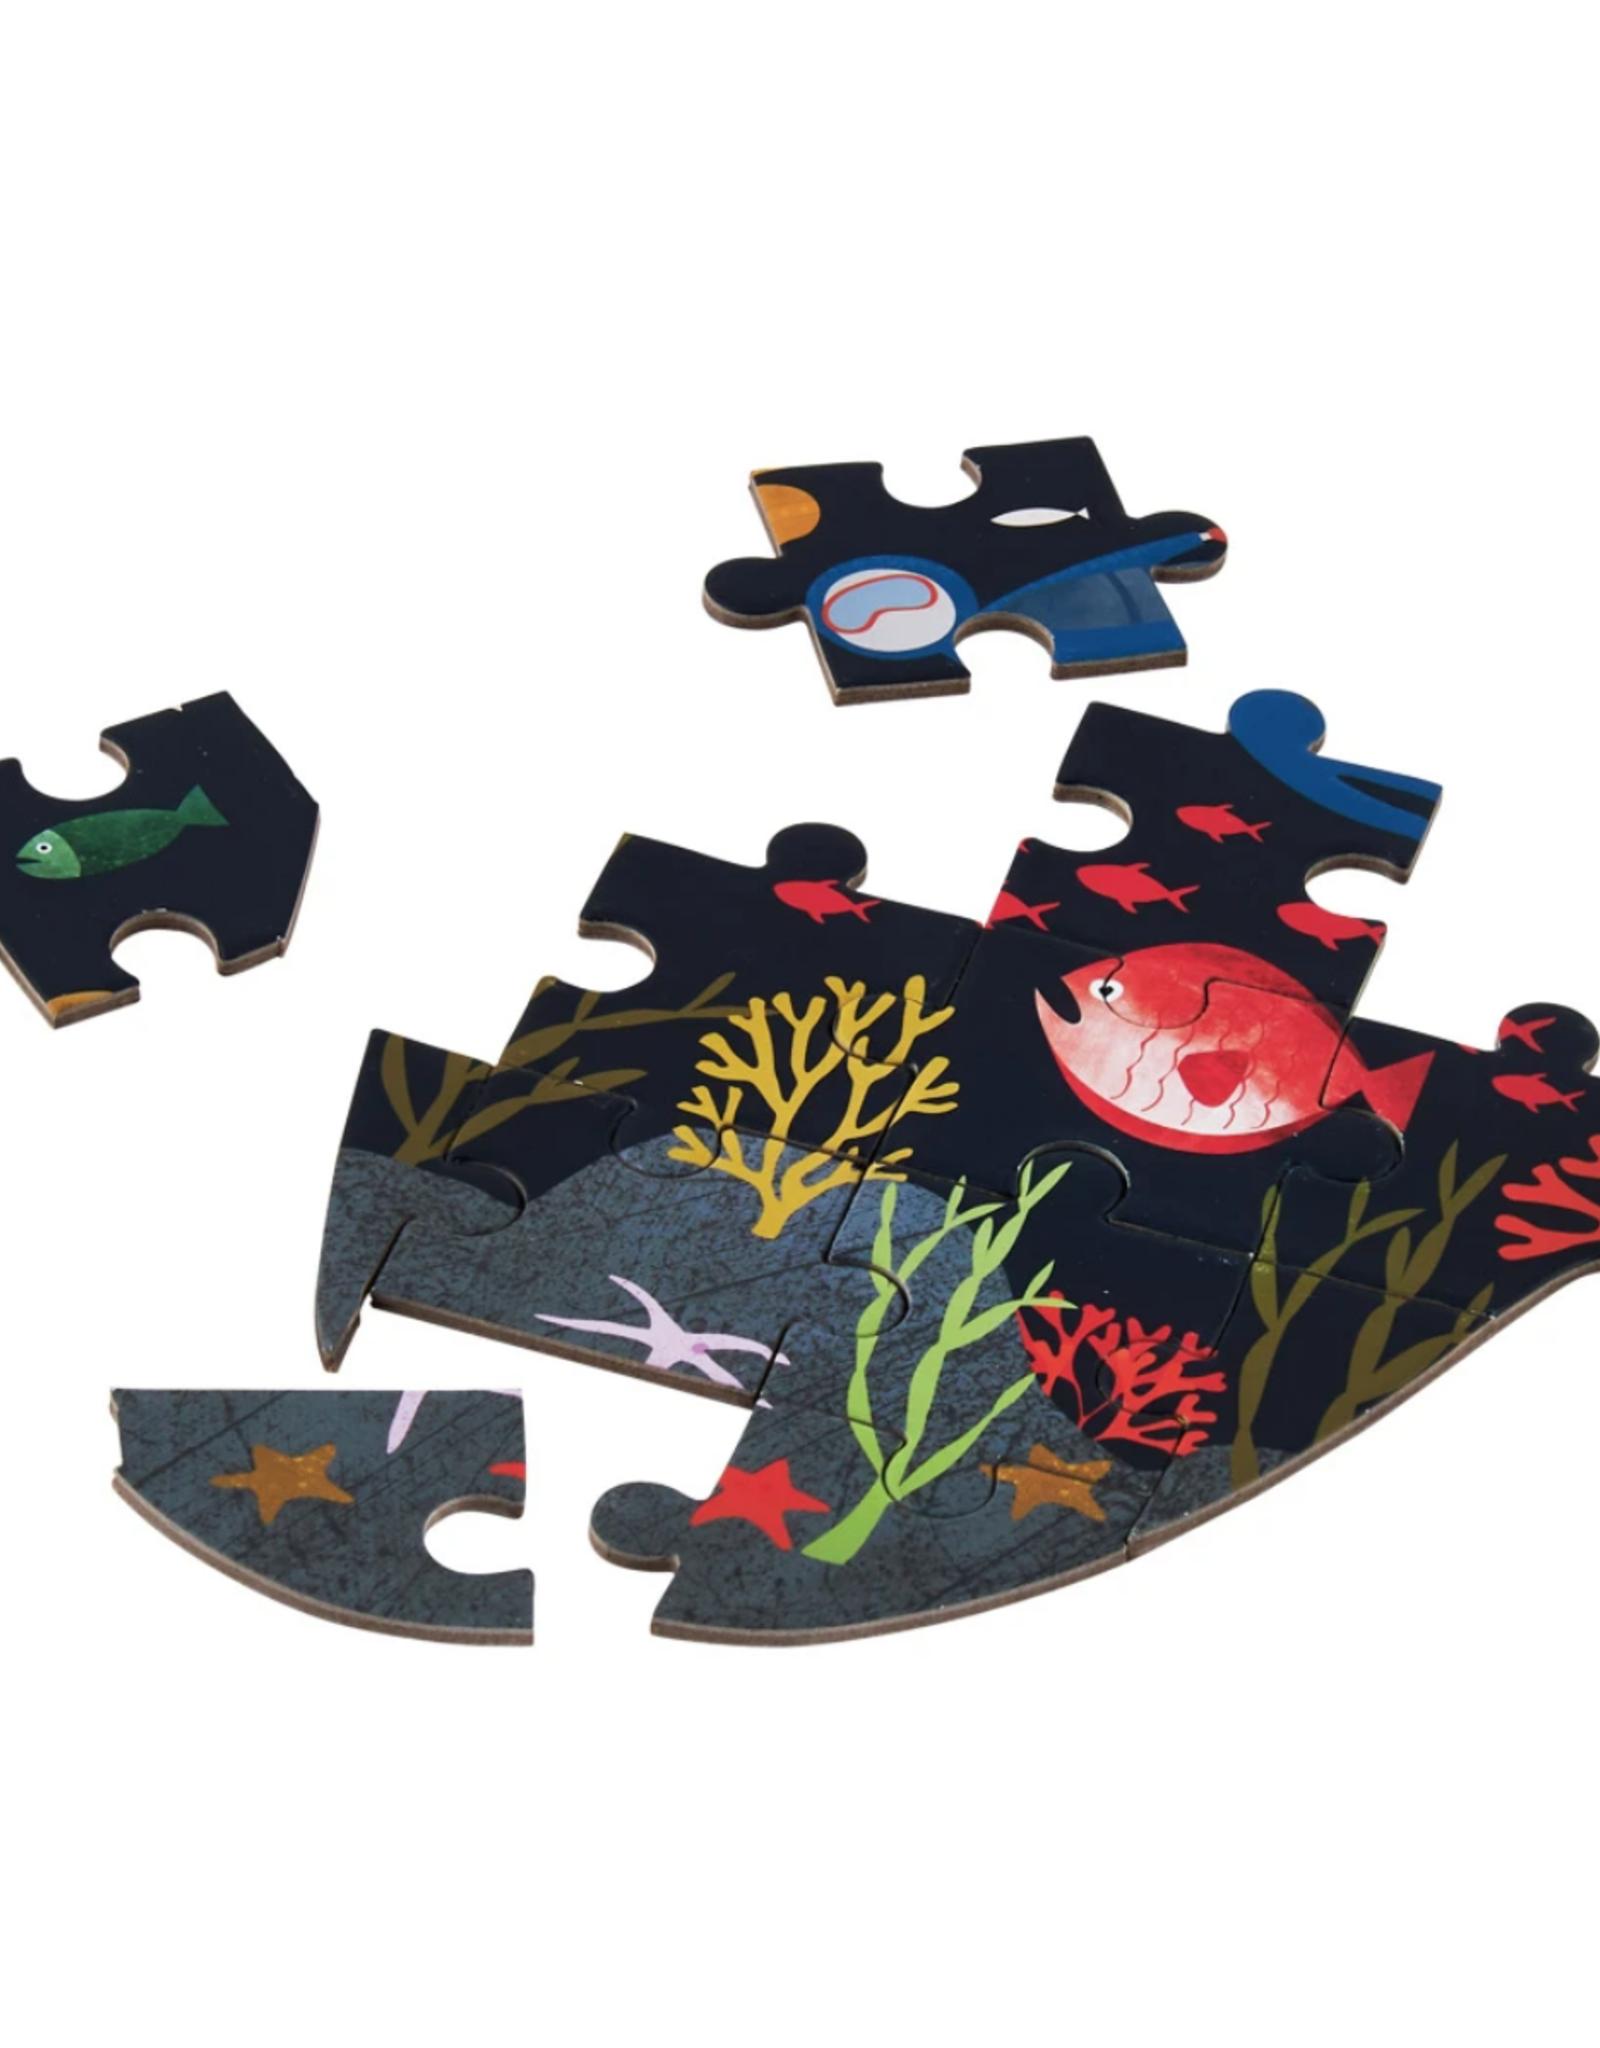 Deep Sea 80pc Jigsaw Puzzle in Shaped Box